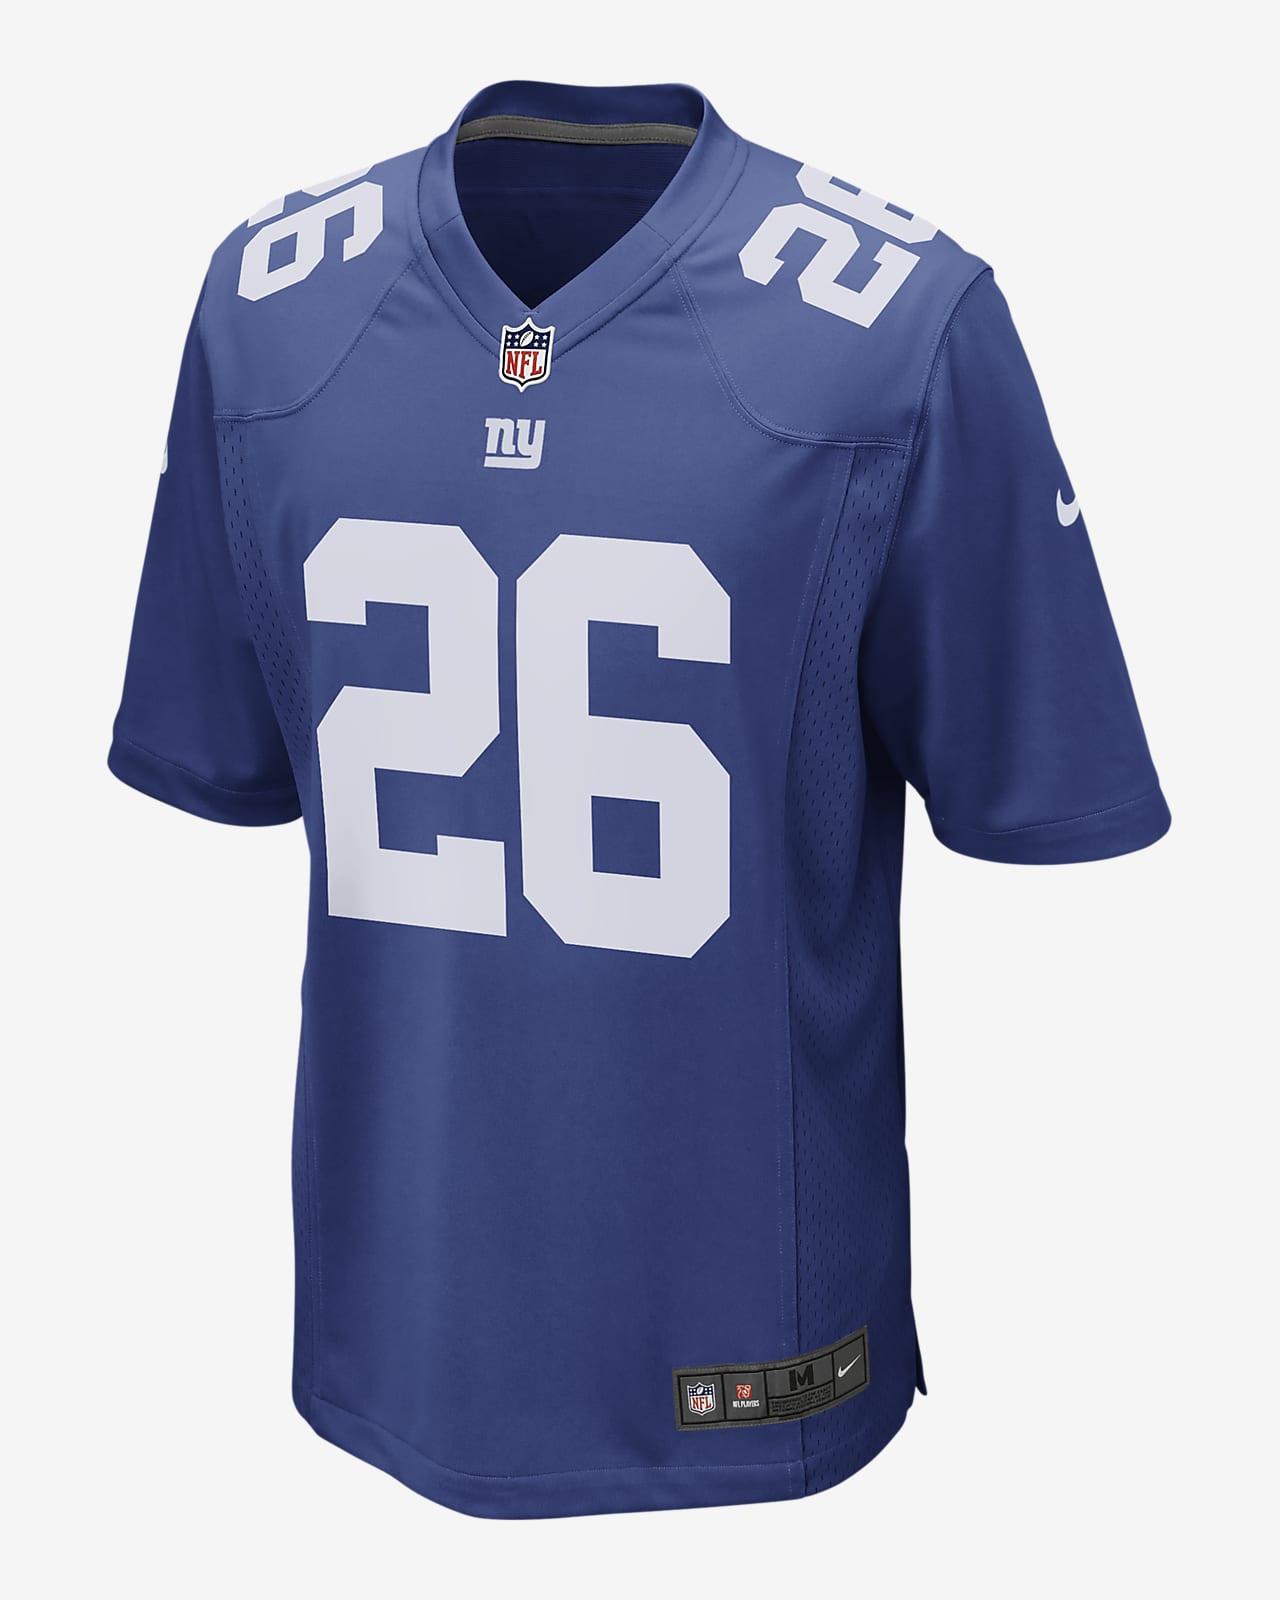 Camiseta de fútbol americano Game para hombre NFL New York Giants (Saquon Barkley)